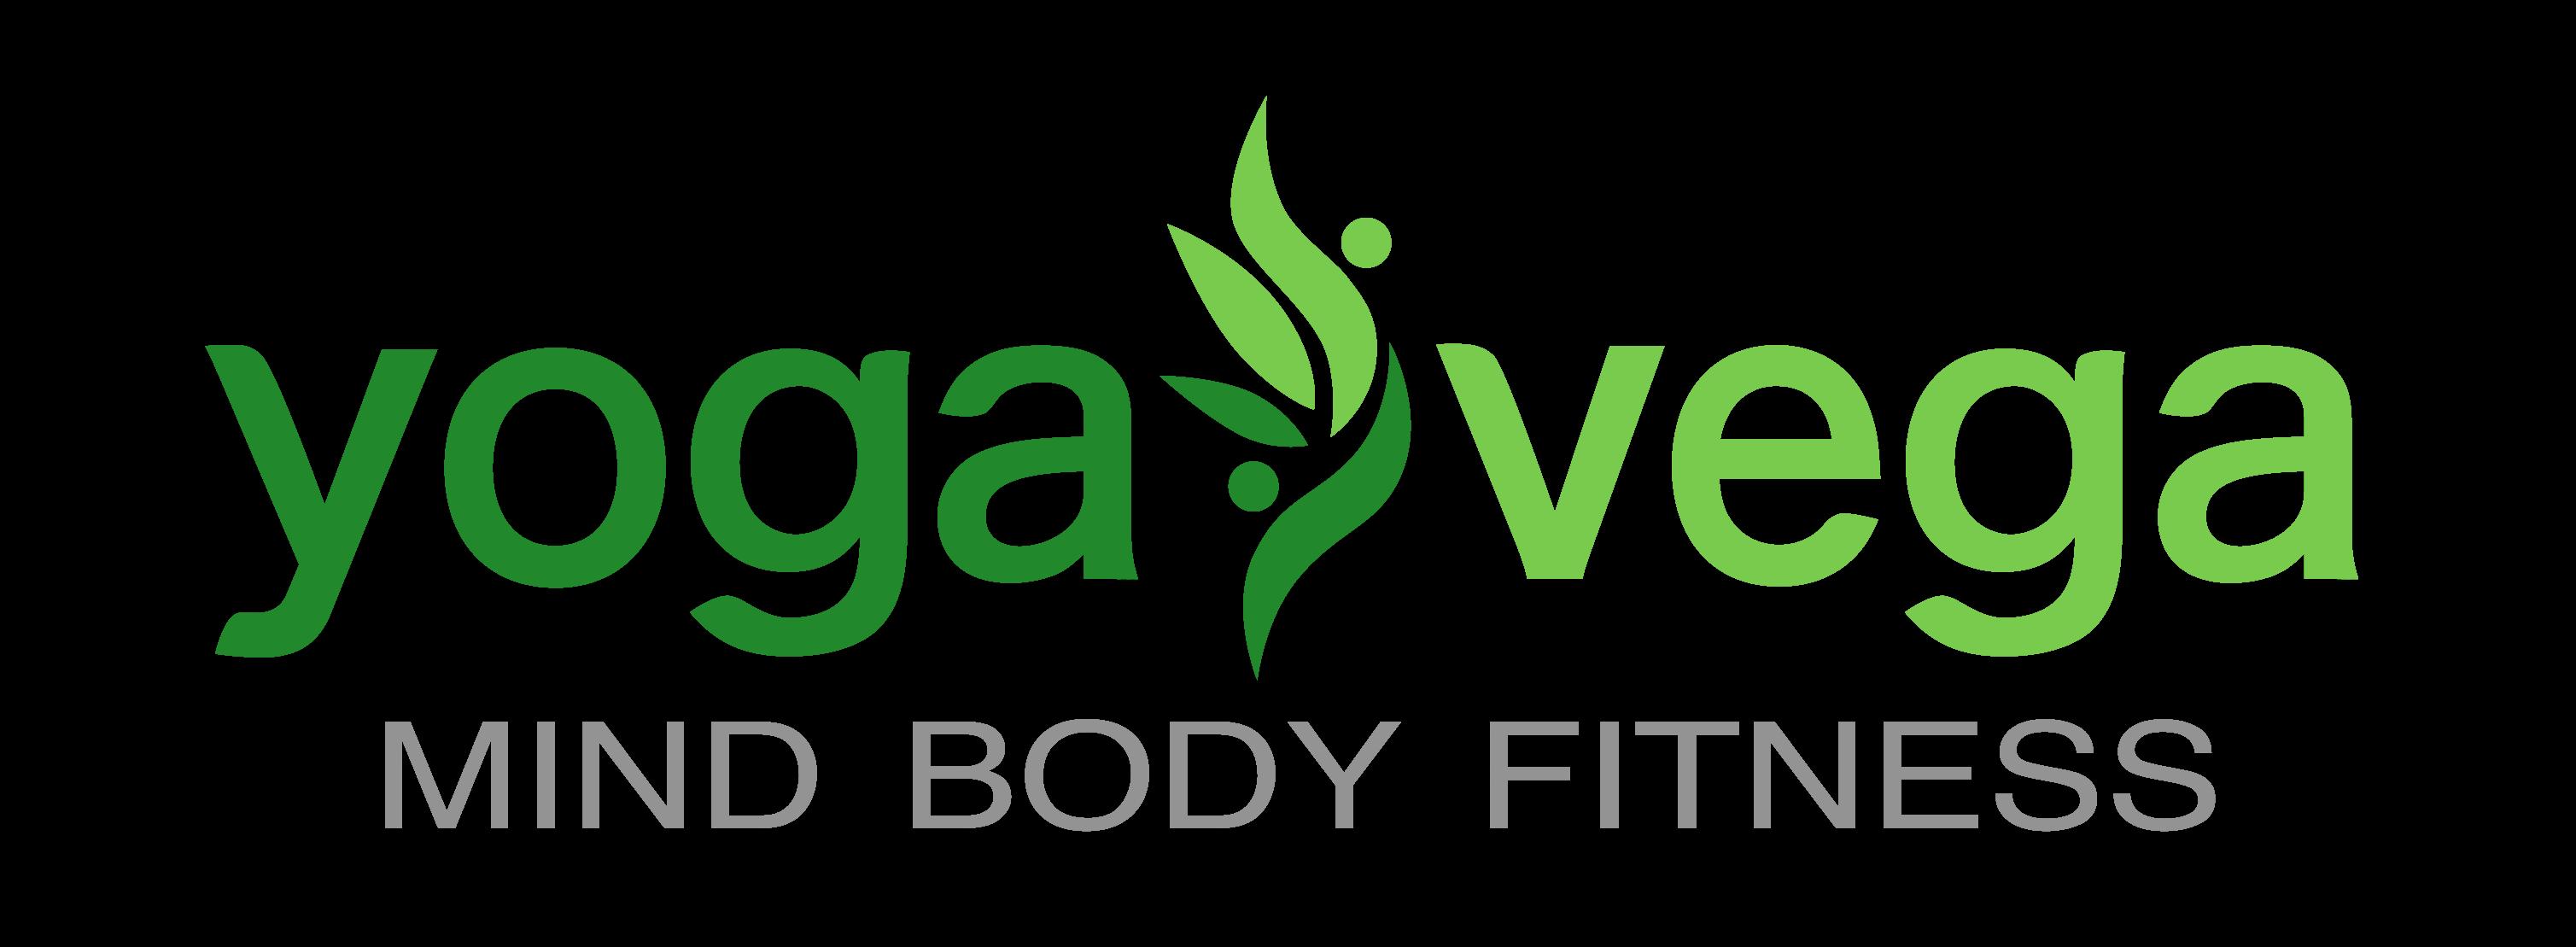 YogaVega